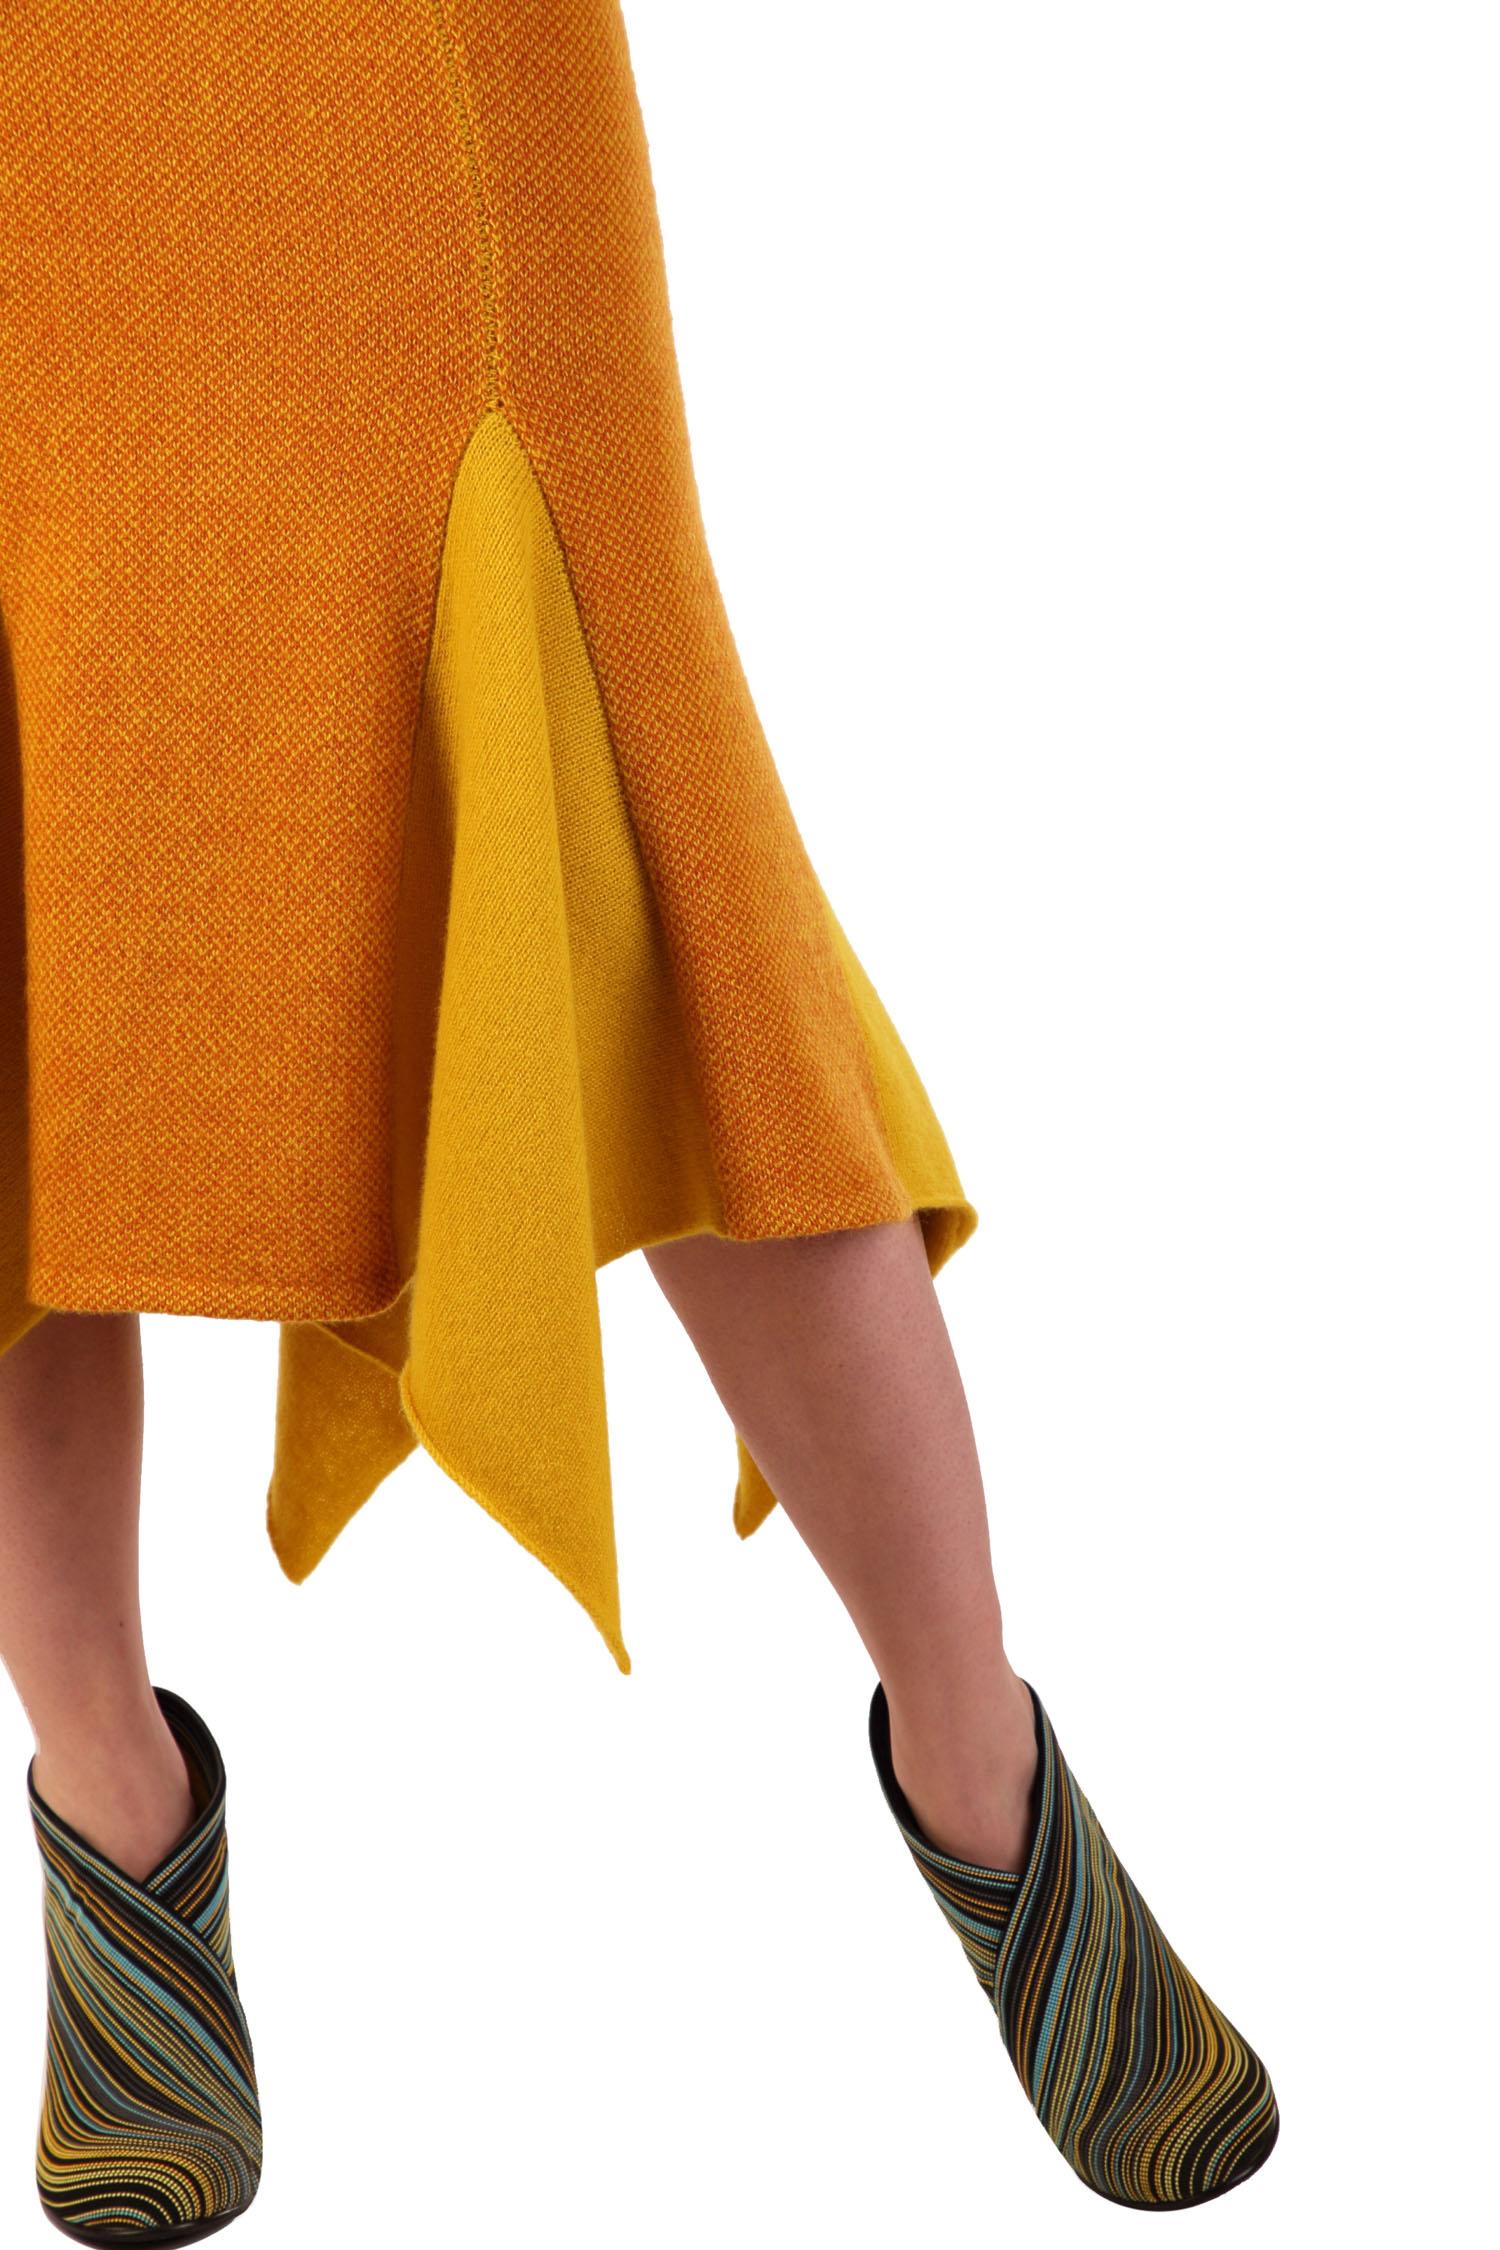 Ochre tweed skirt2